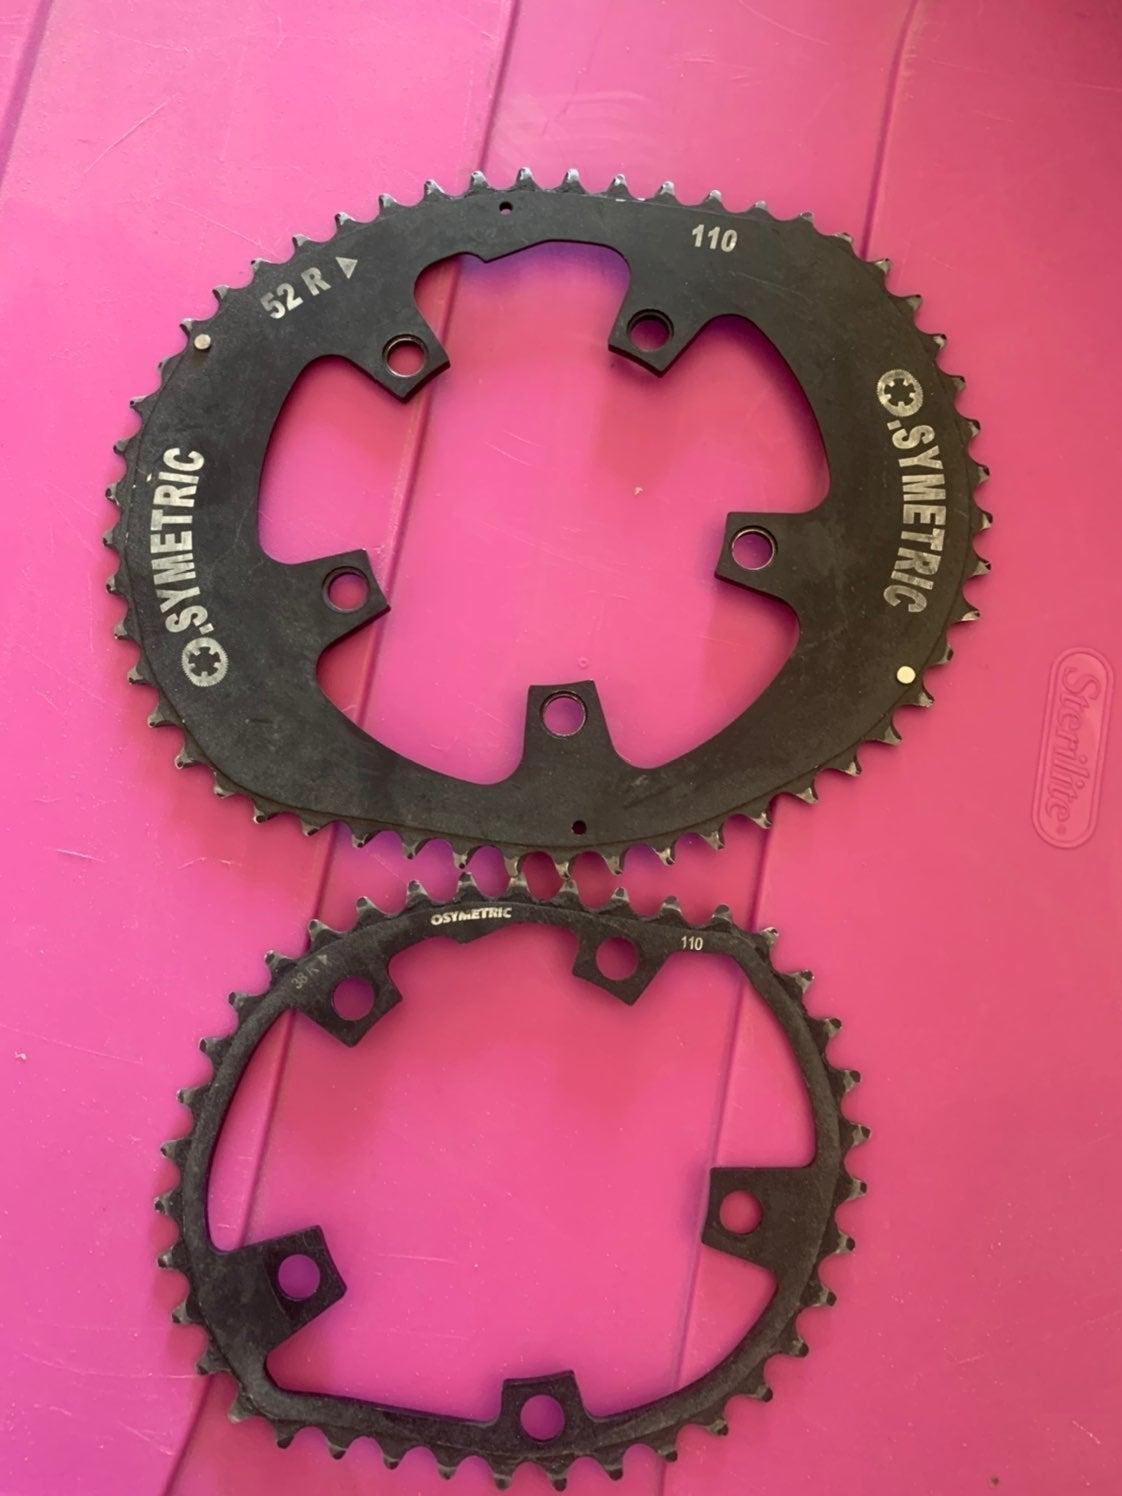 Osymetric chain ring set